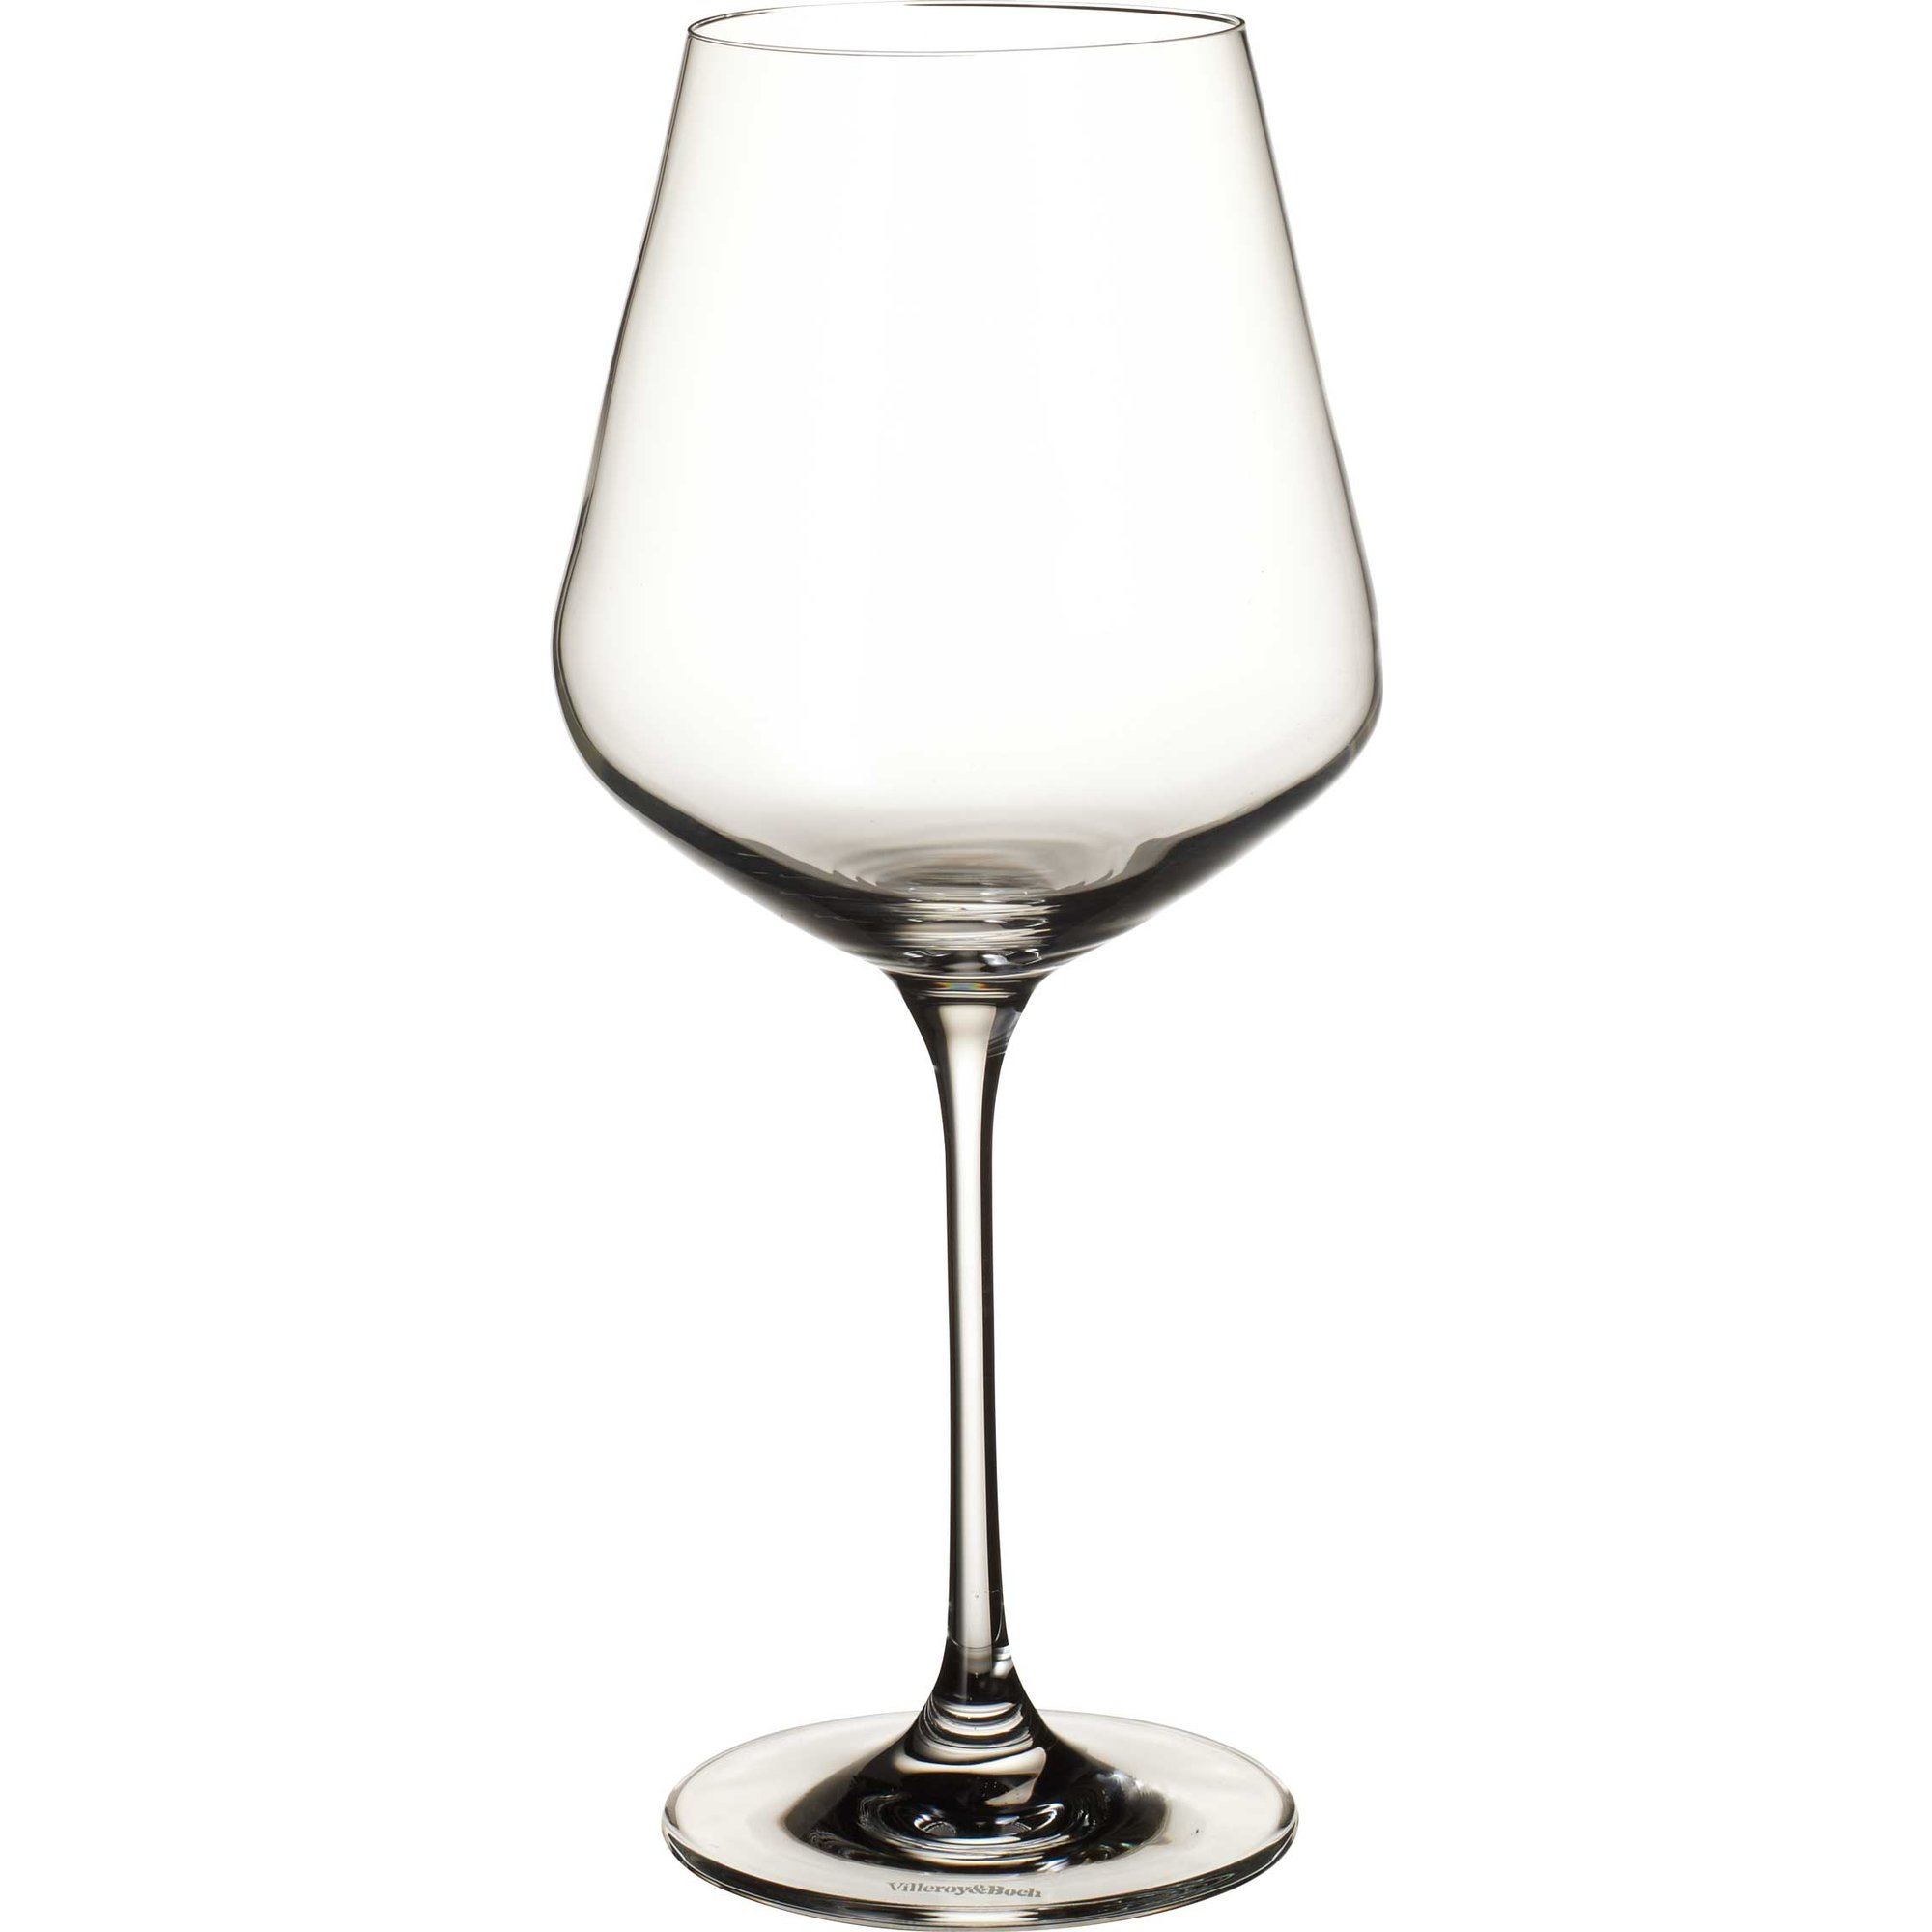 Villeroy & Boch La Divina Rödvinsglas 4-pack